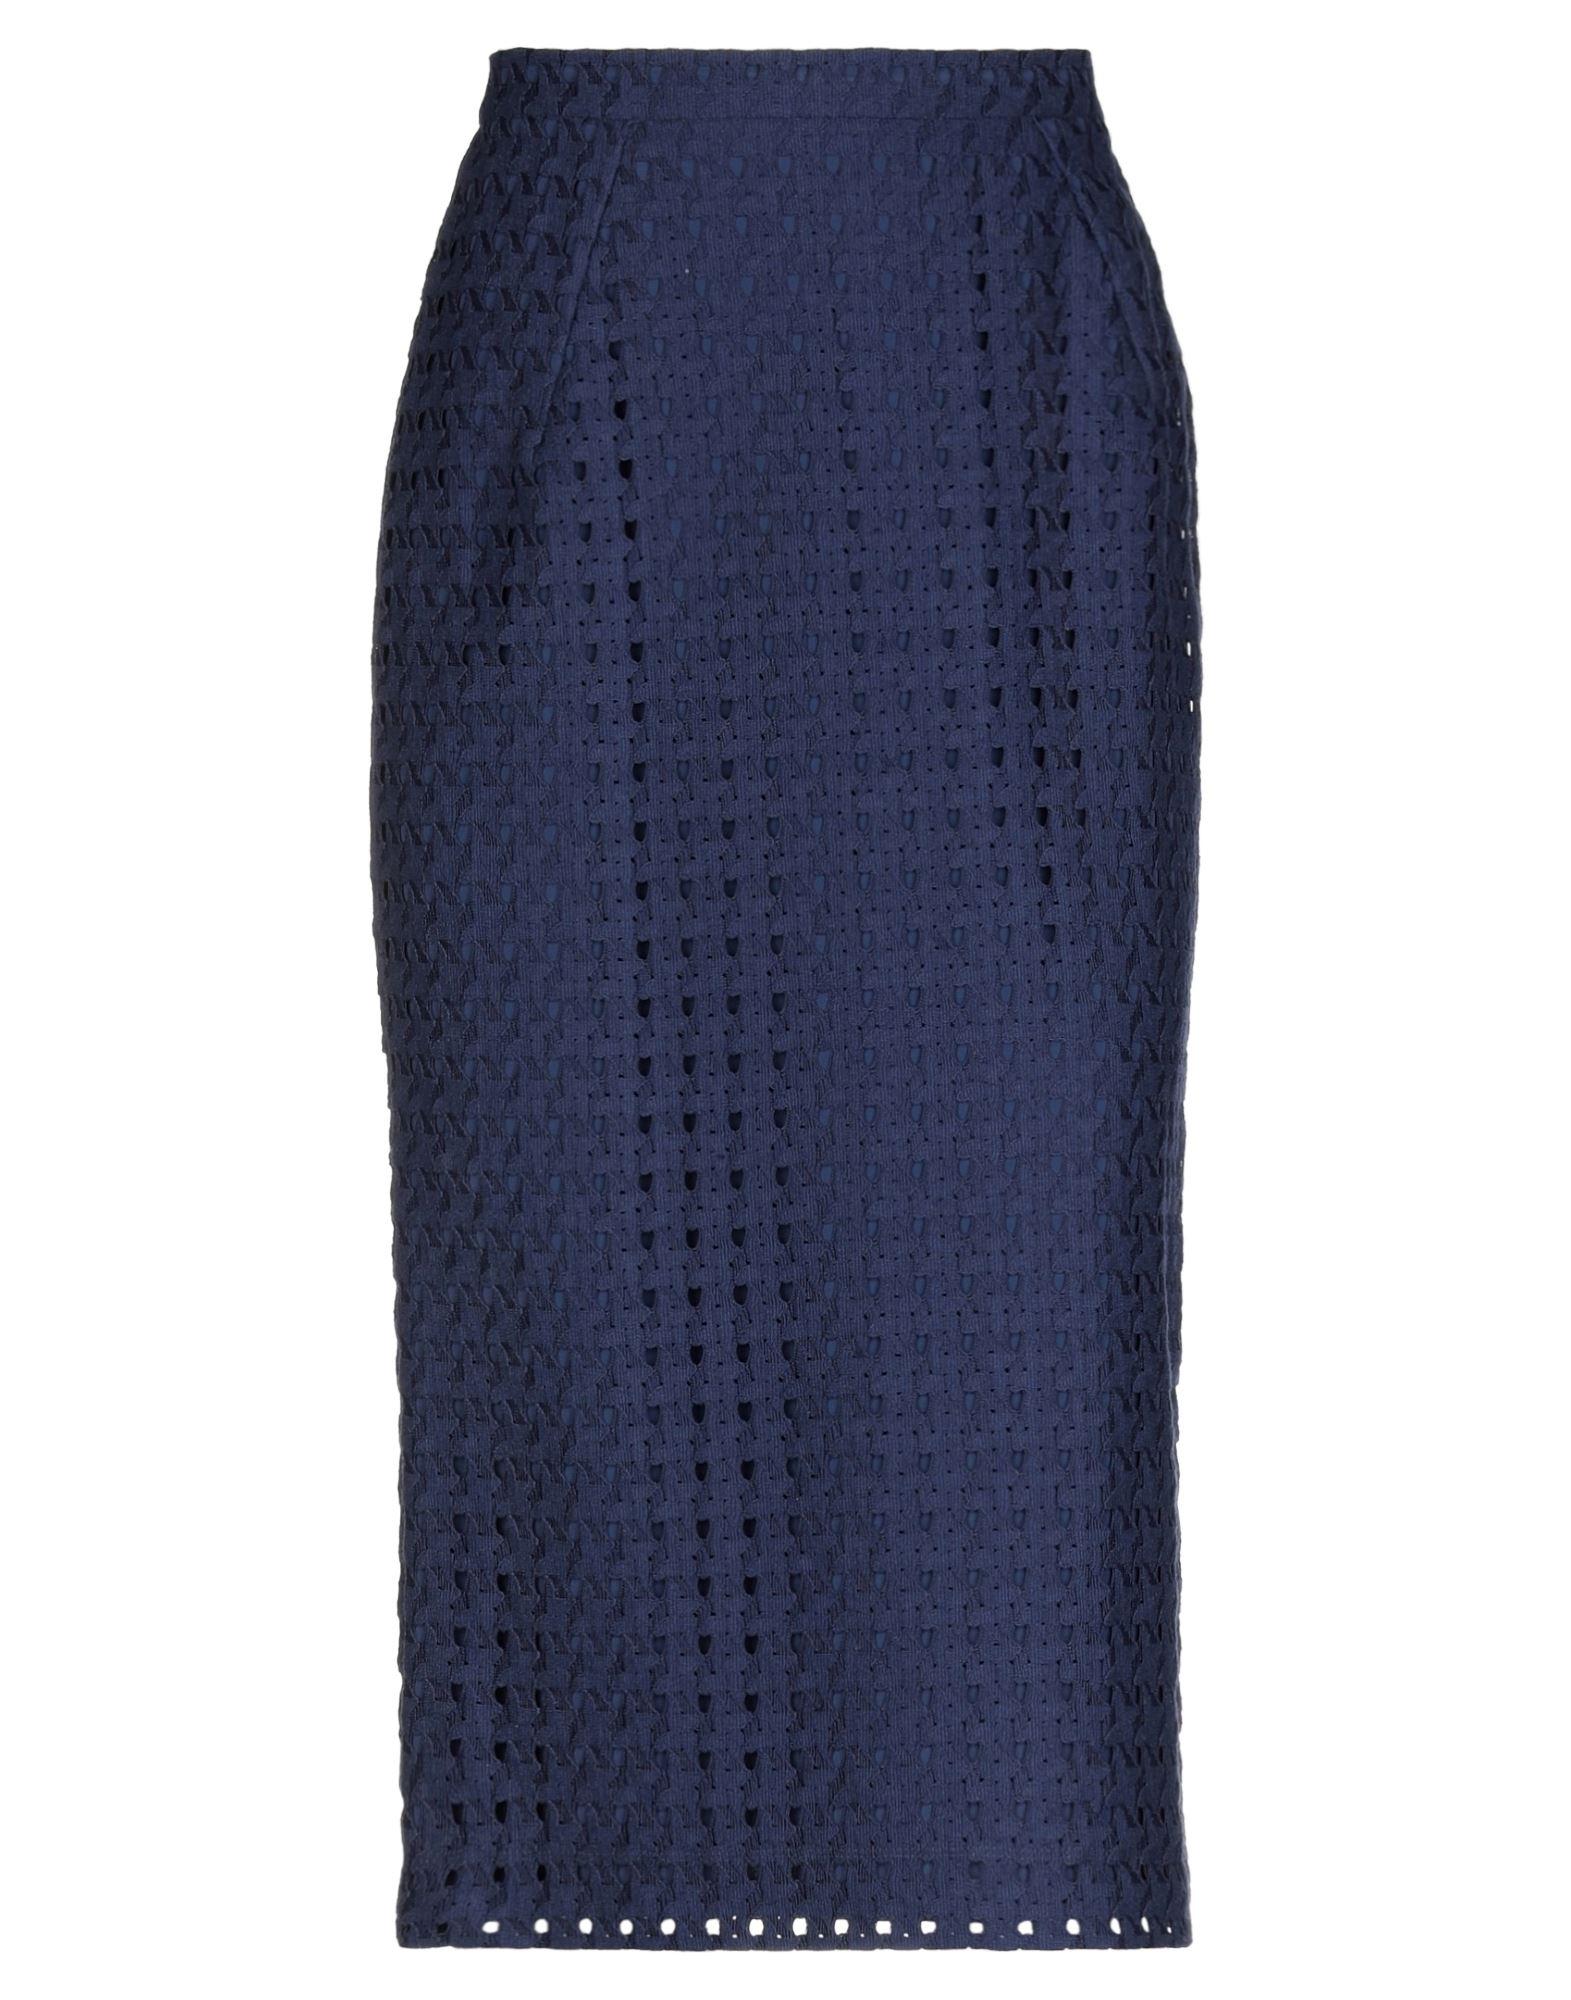 MARIA GRAZIA SEVERI Юбка длиной 3/4 юбка maria grazia severi юбка